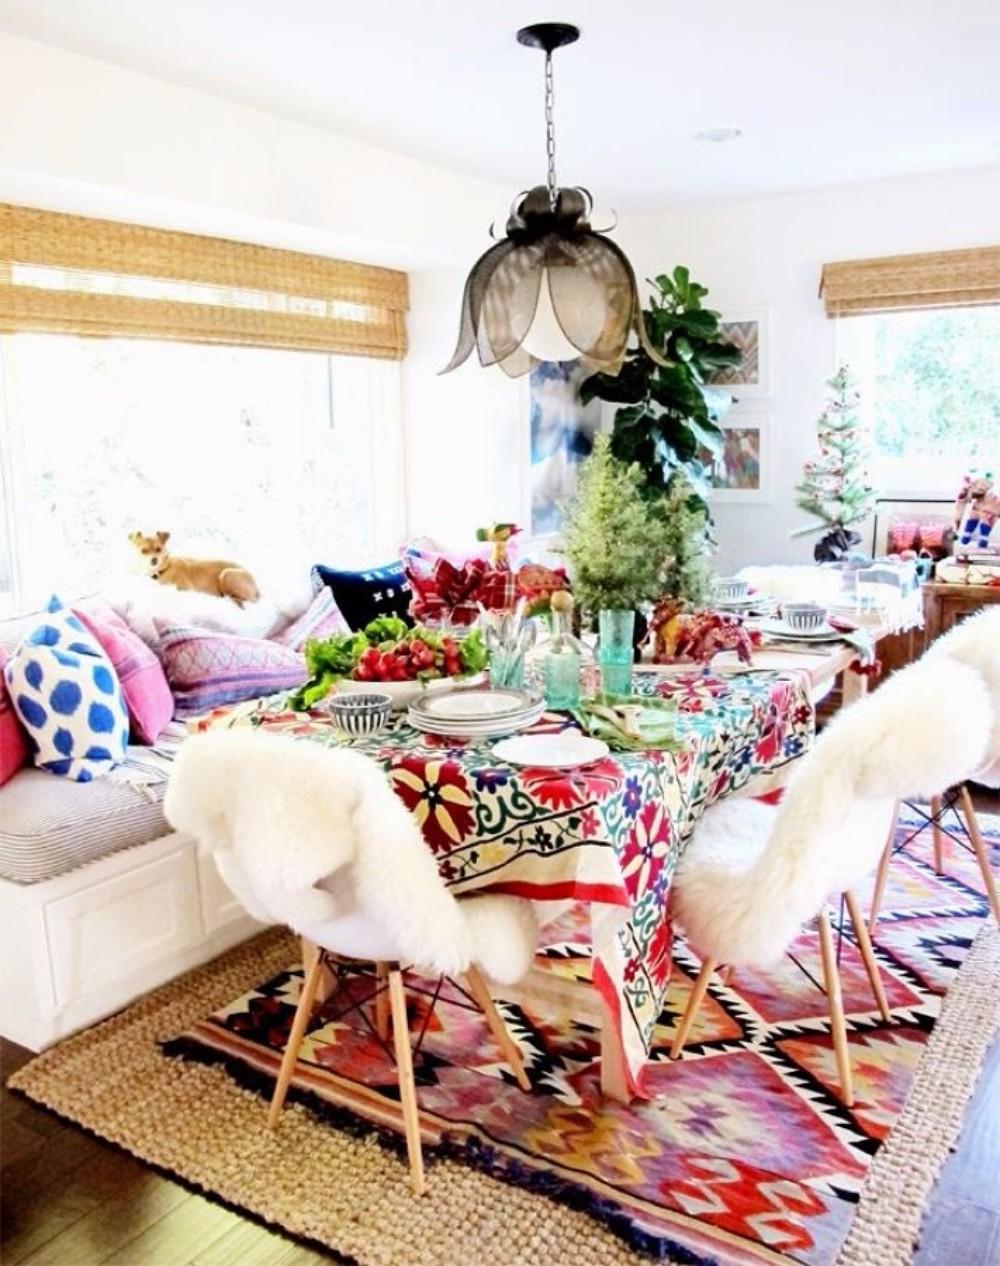 boho chic 25 Boho Chic Dining Room Designs That Will Inspire You 25 boho chic dining room designs that will inspire you 18